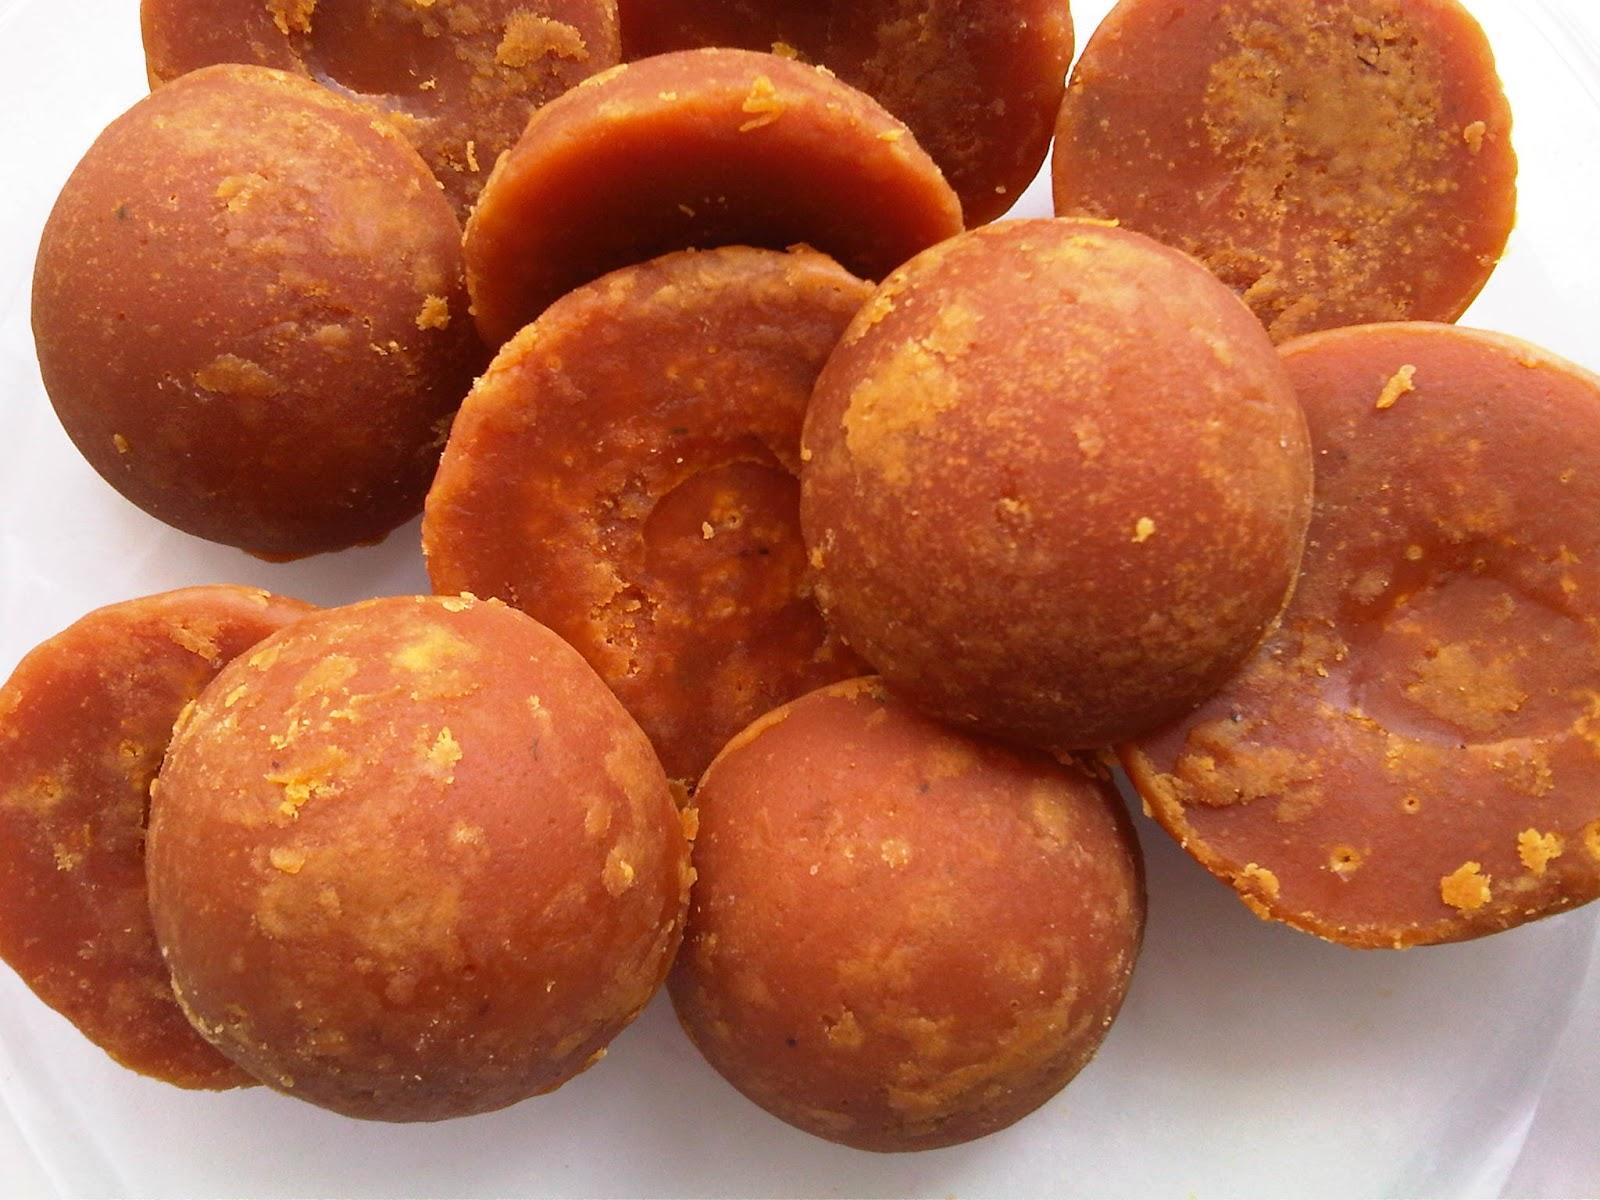 Hasil gambar untuk jual gula merah kelapa